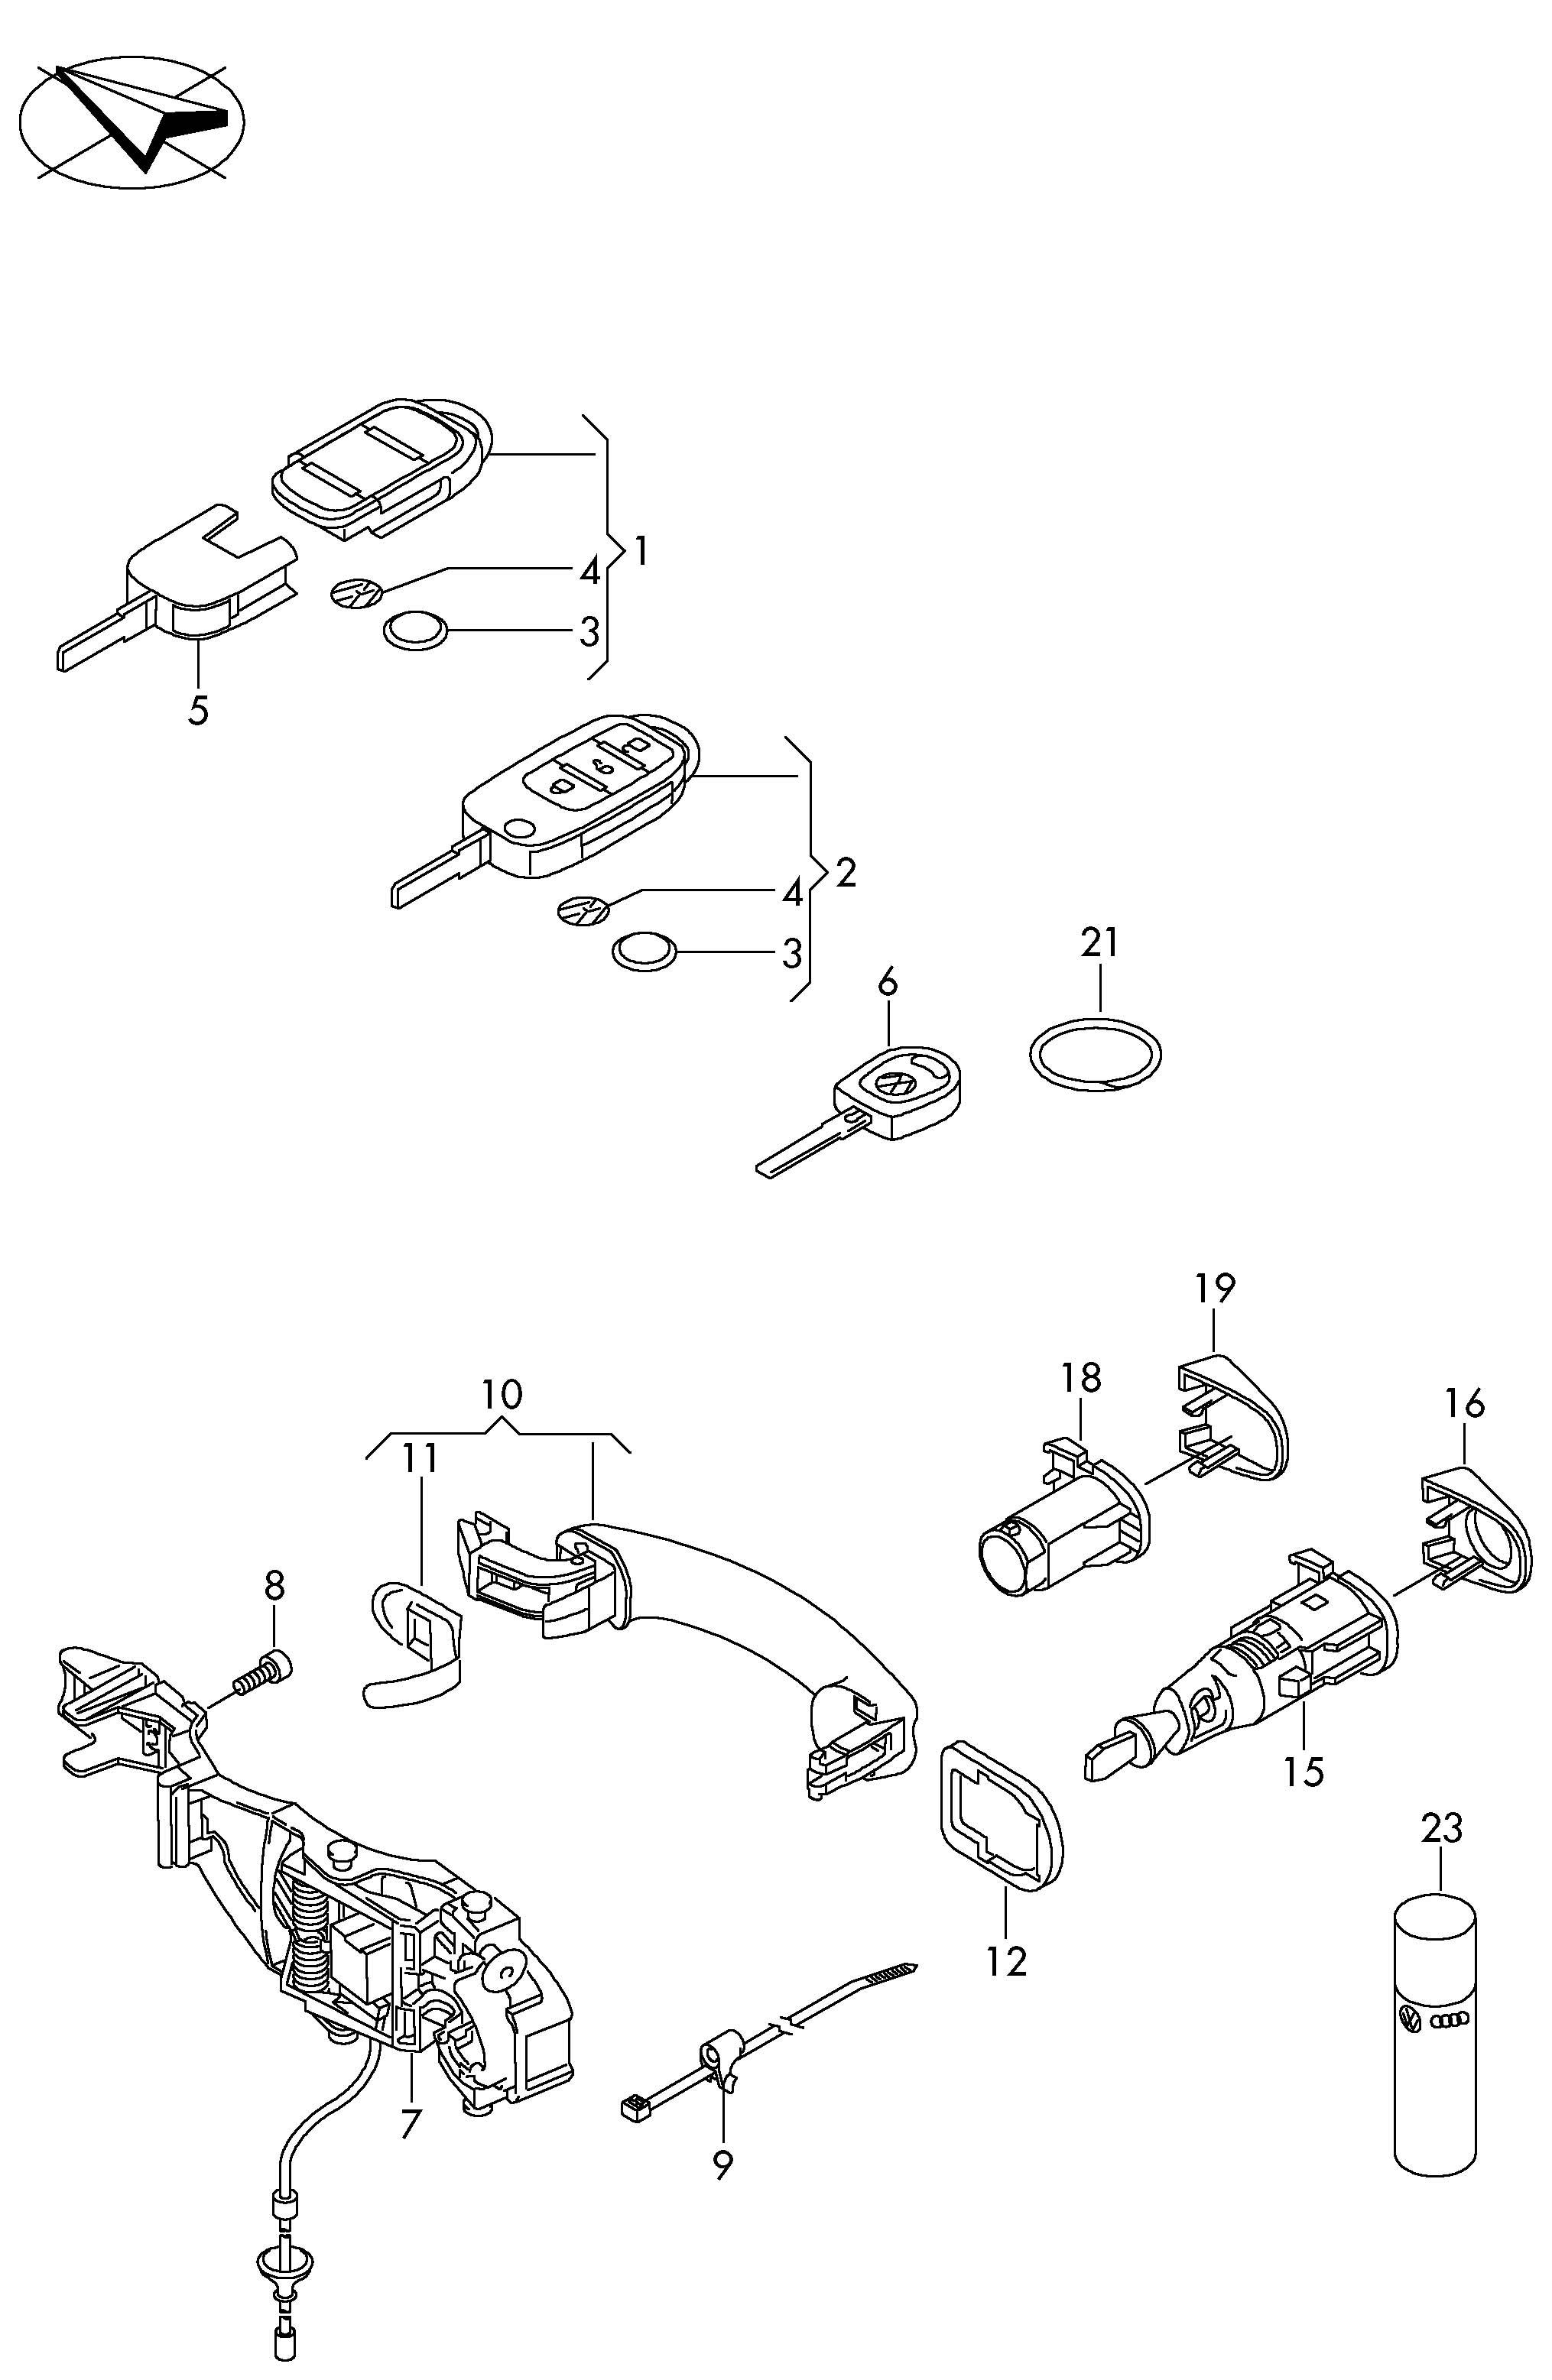 vw bus wiring diagram on 74 volkswagen beetle starter wiring diagrams